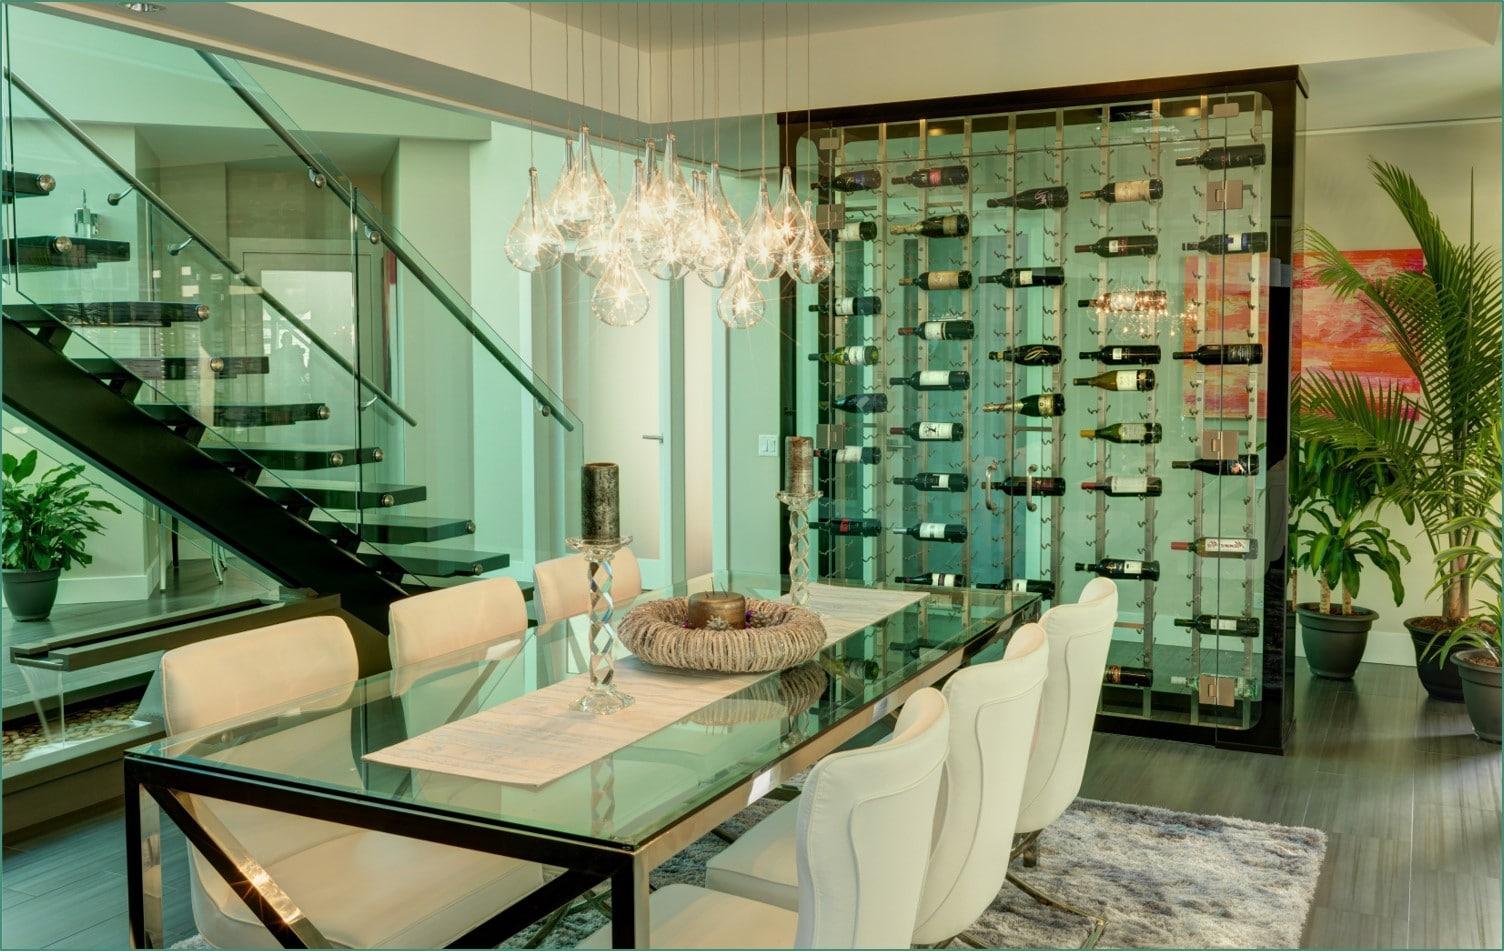 Peachy Home Wine Cellar Designers Group Las Vegas Custom Wine Download Free Architecture Designs Scobabritishbridgeorg